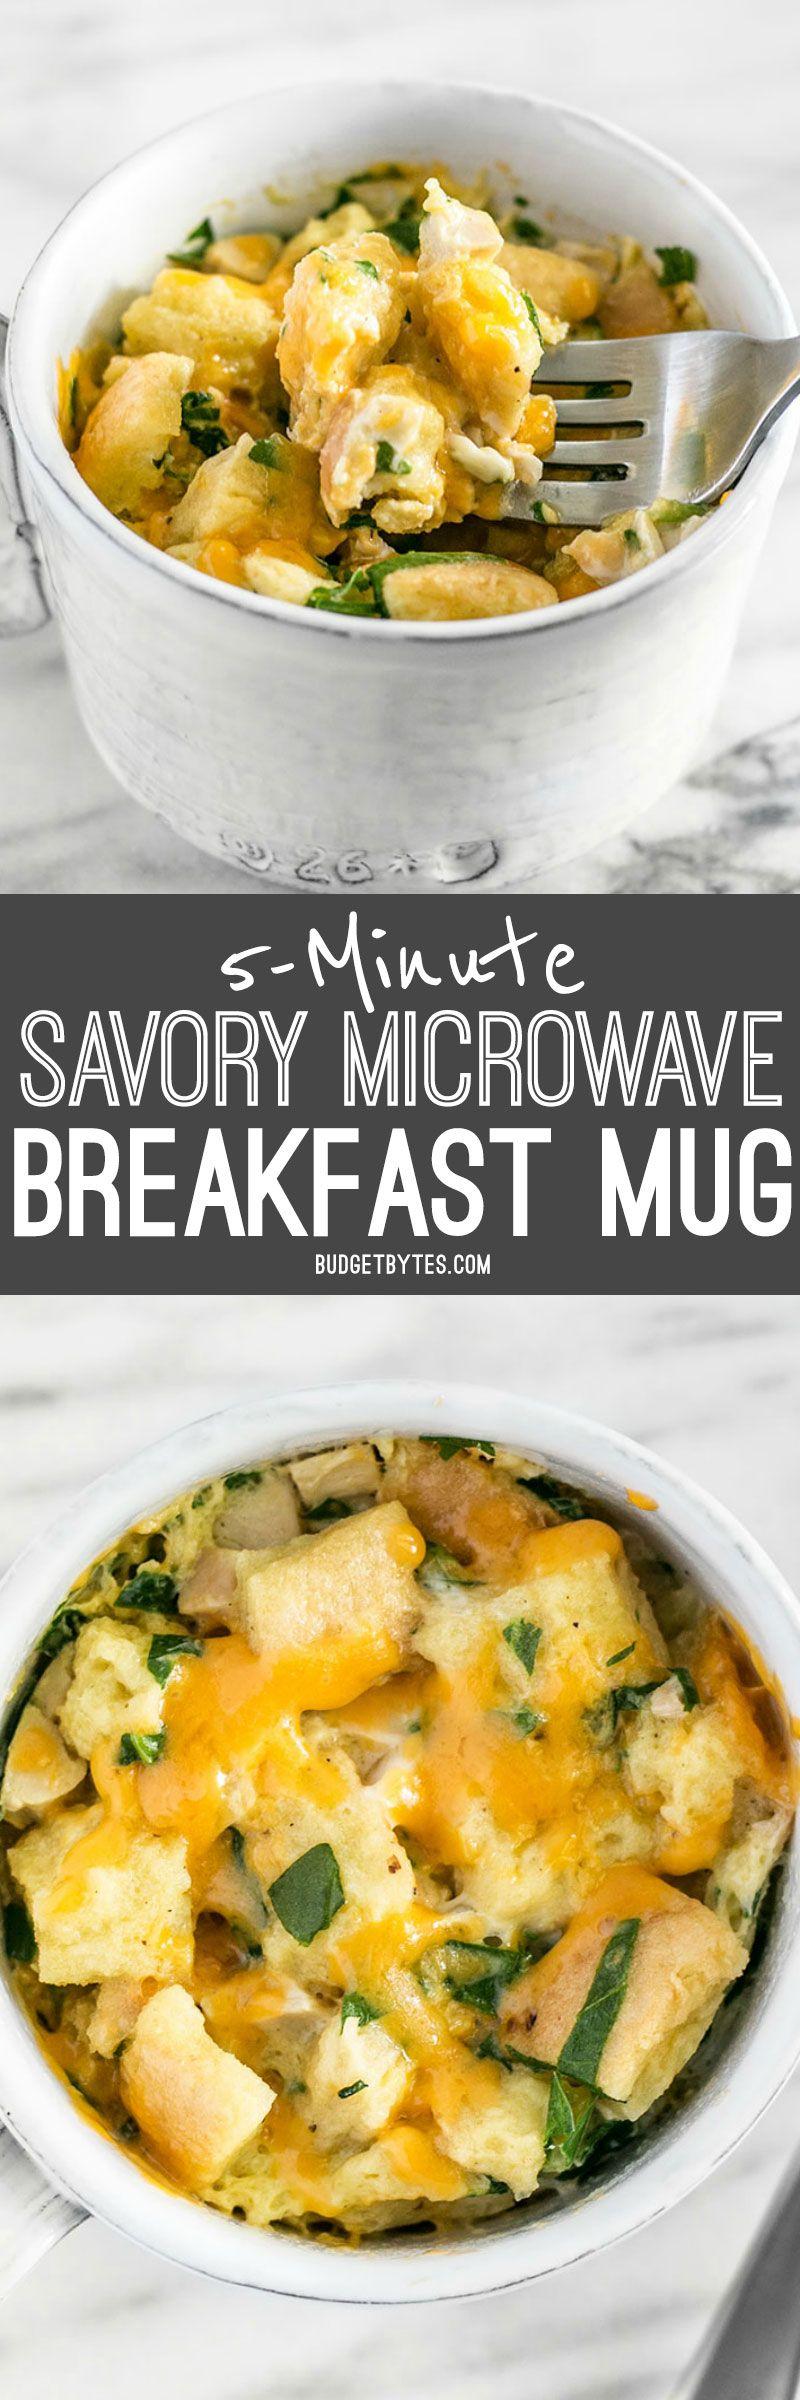 5 Minute Savory Microwave Breakfast Mug Recipe